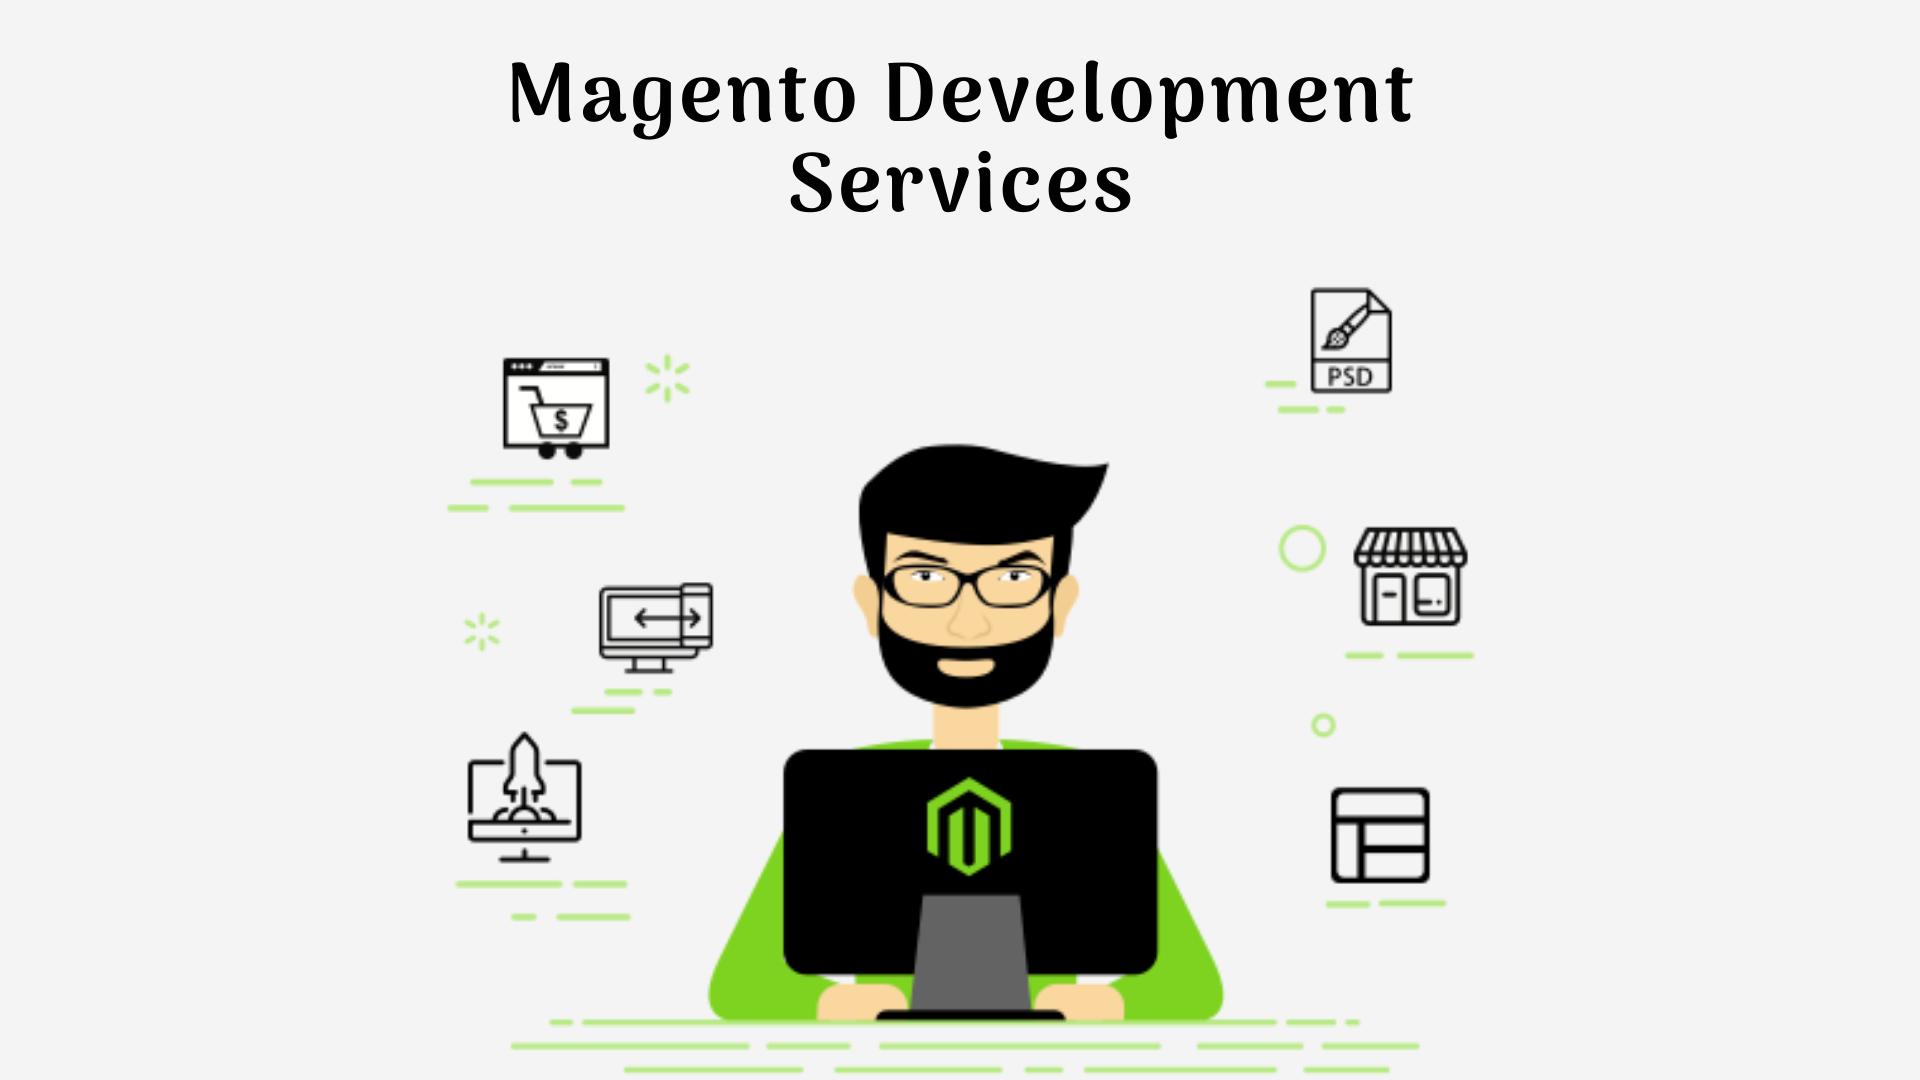 Magento Development Services In 2020 Magento Ecommerce Development Magento